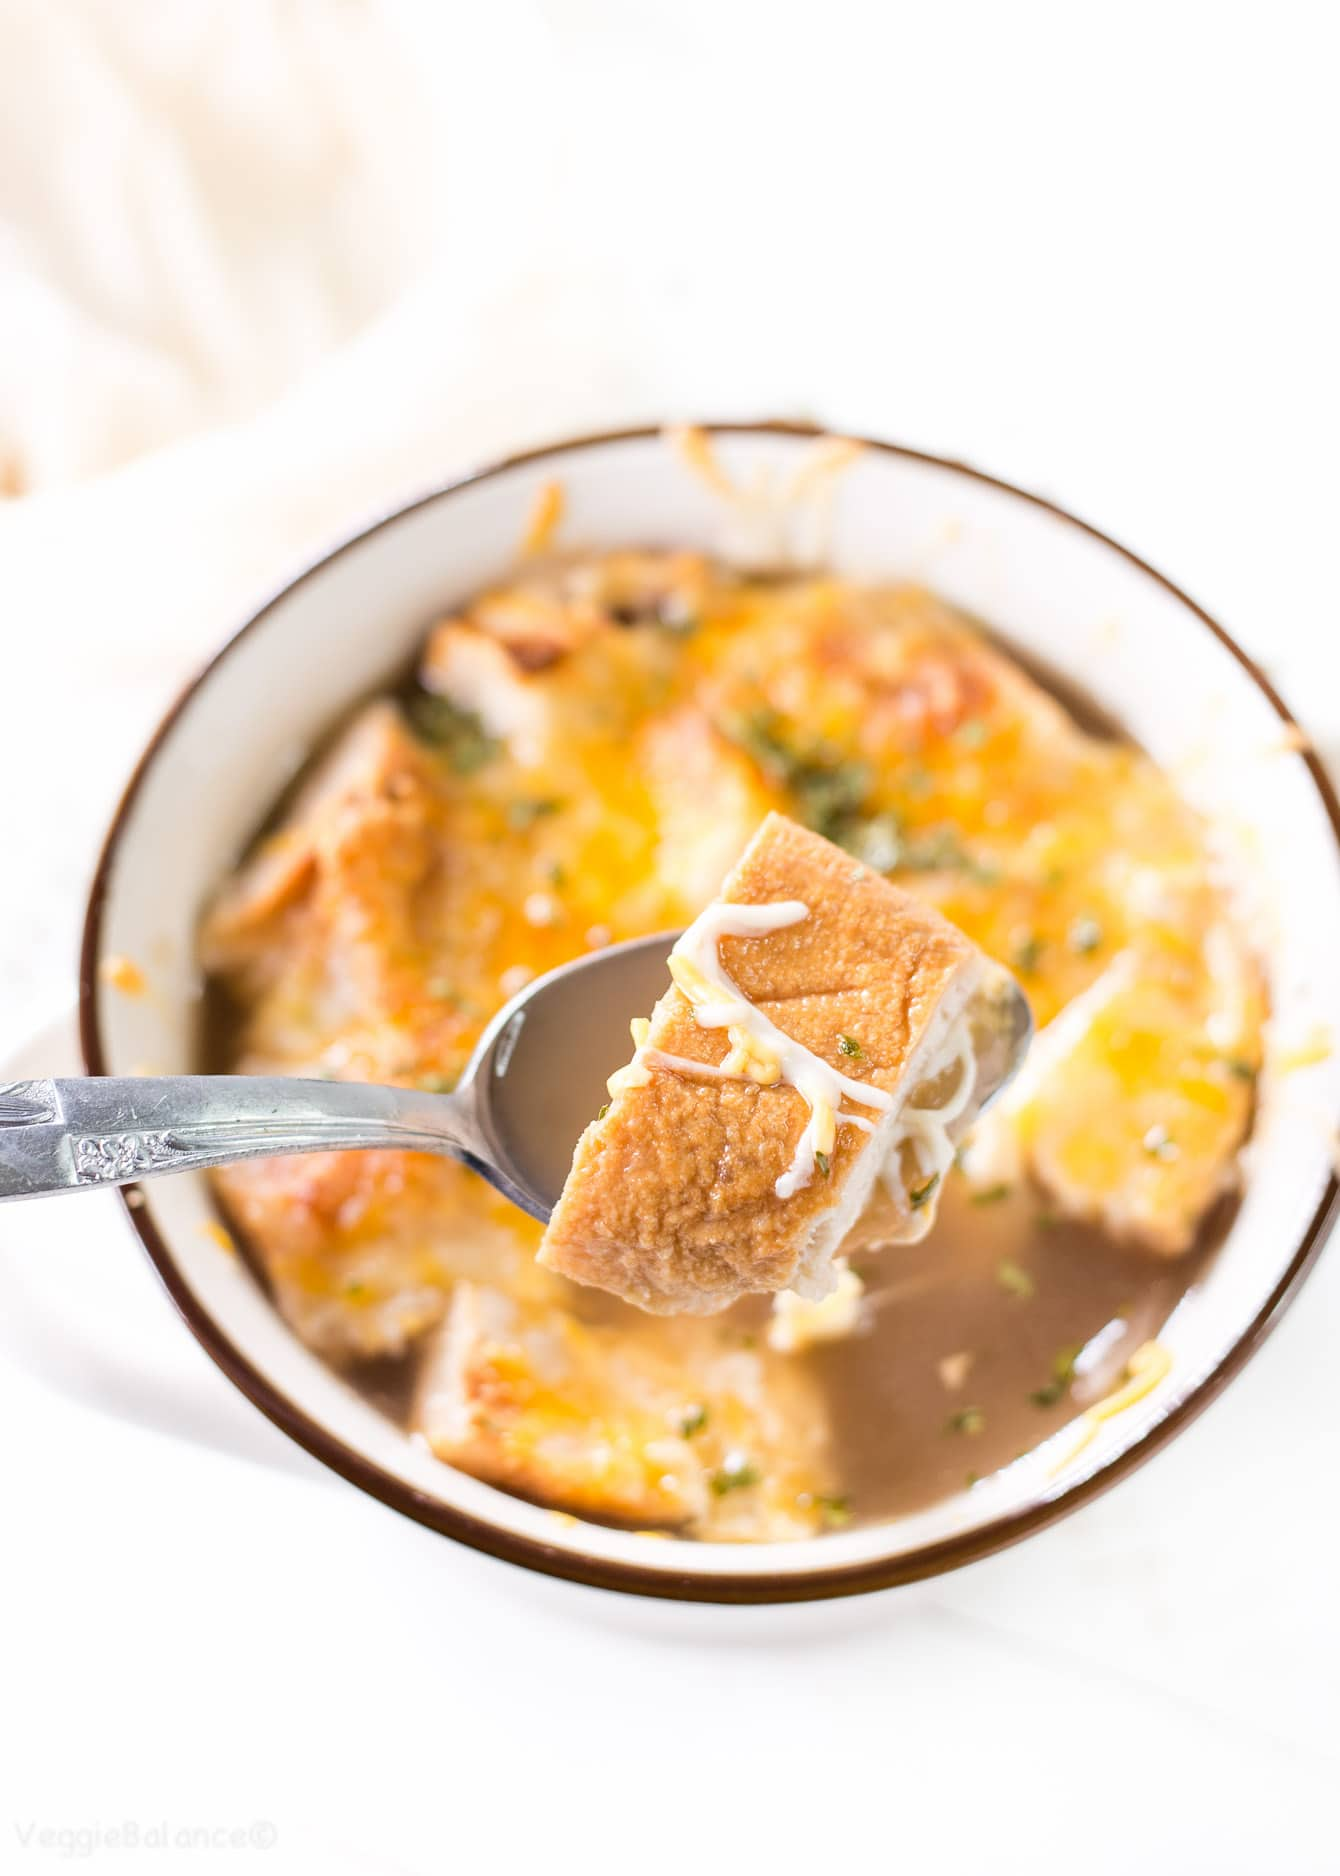 Gluten-Free French Onion Soup